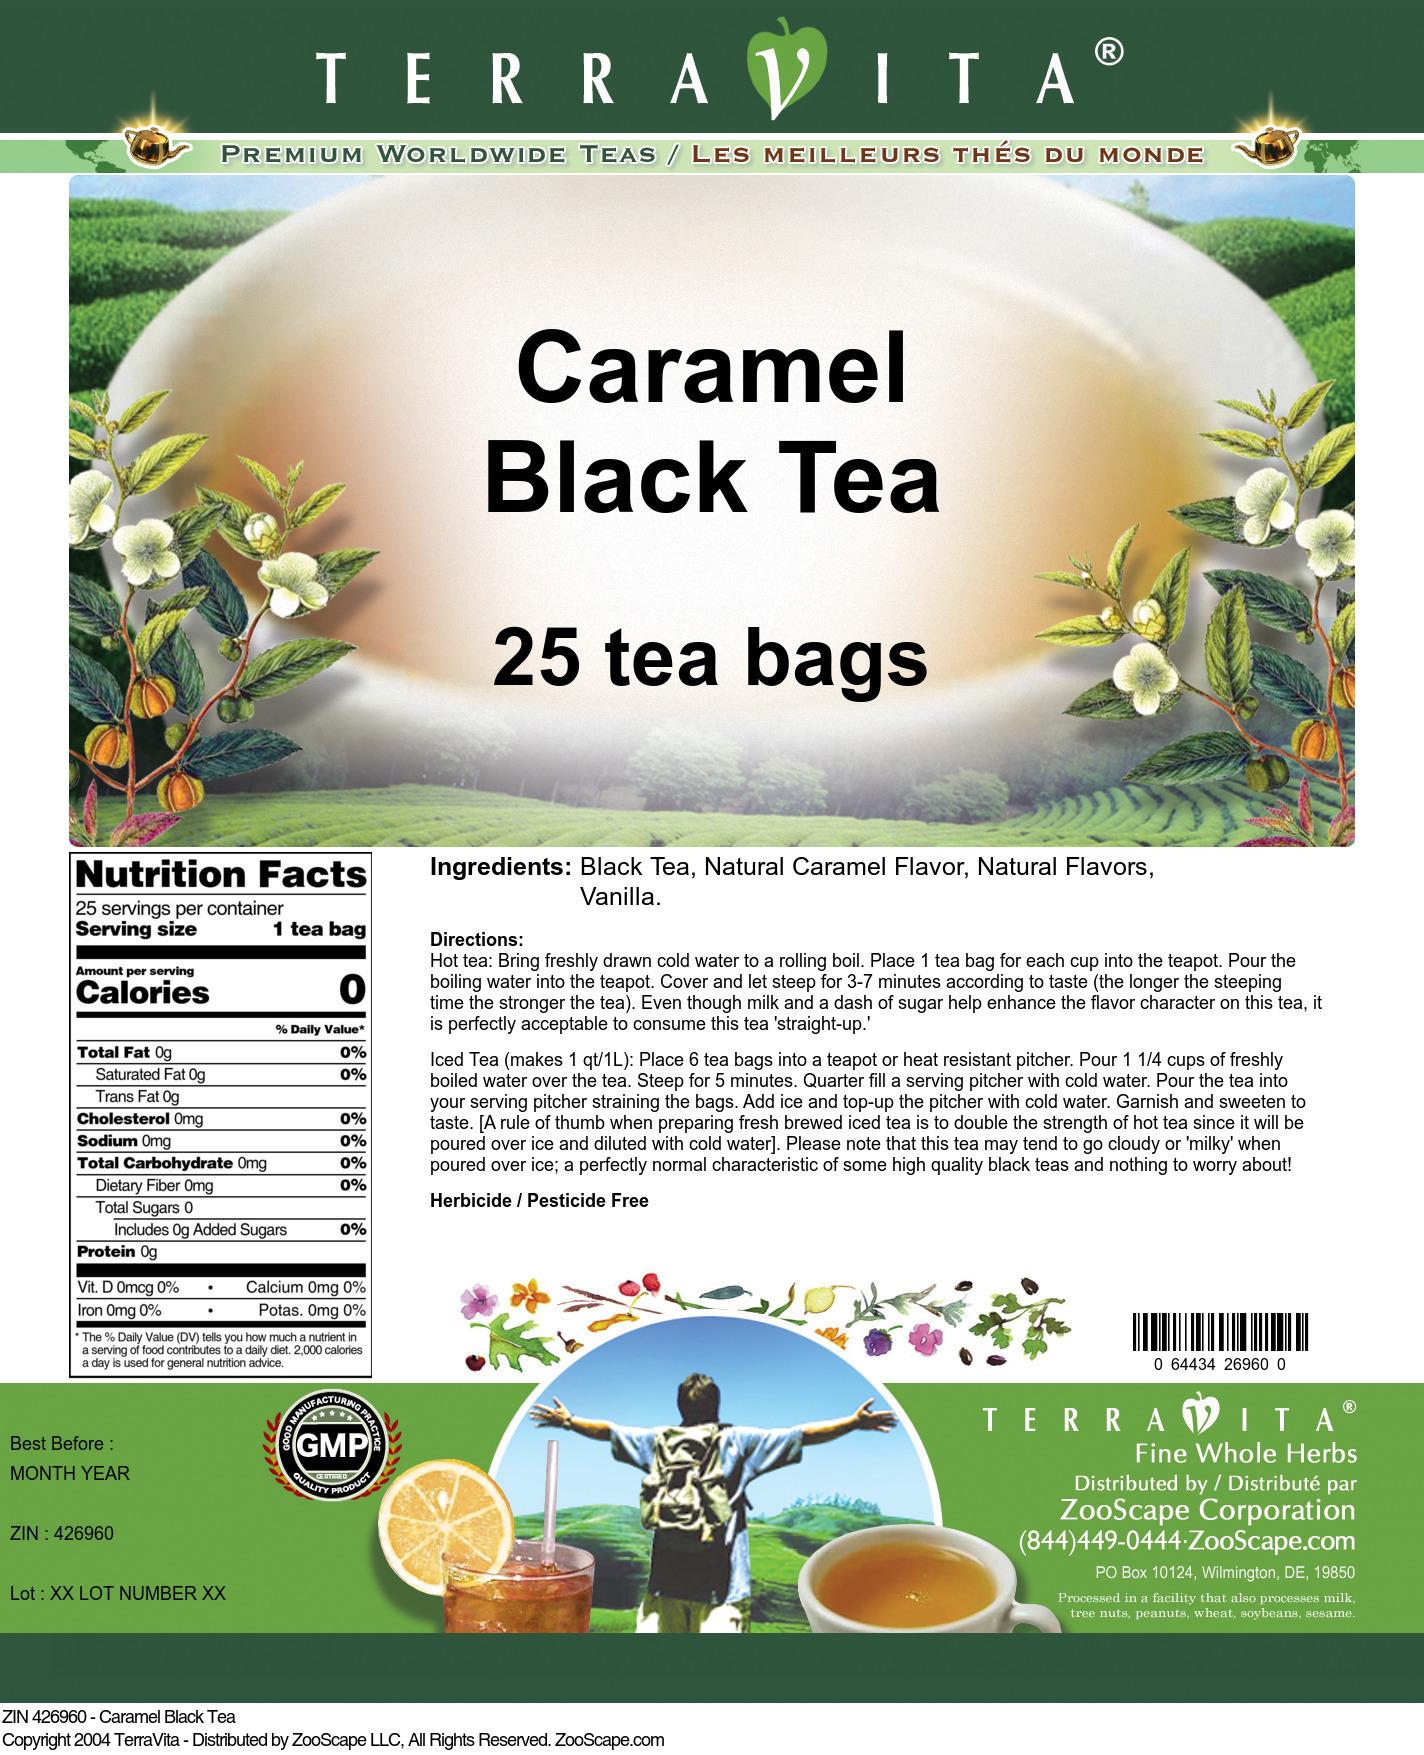 Caramel Black Tea